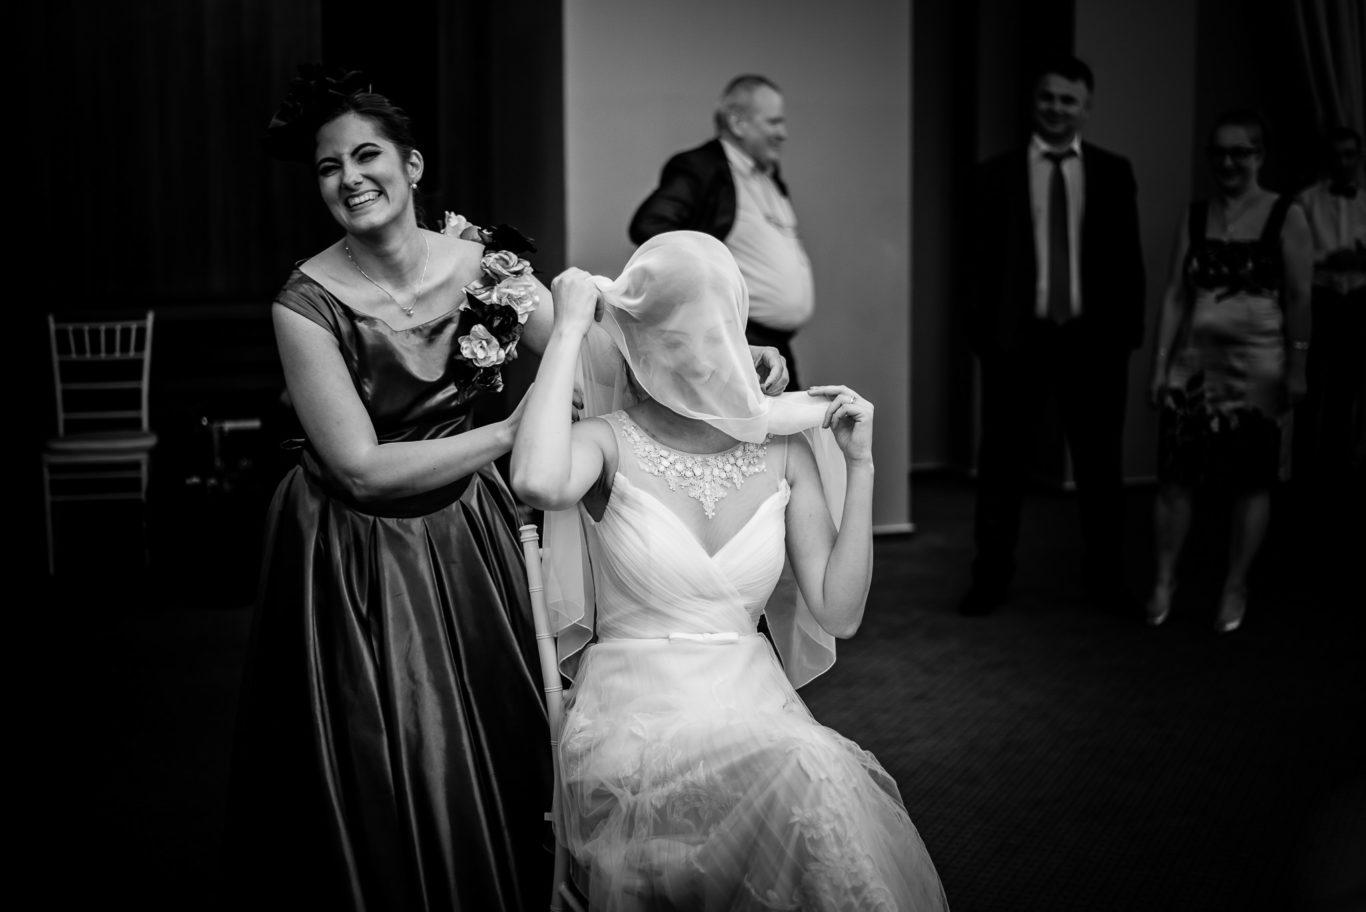 0982-Fotografie-nunta-Bucuresti-Oana-Catalin-fotograf-Ciprian-Dumitrescu-DSC_6164